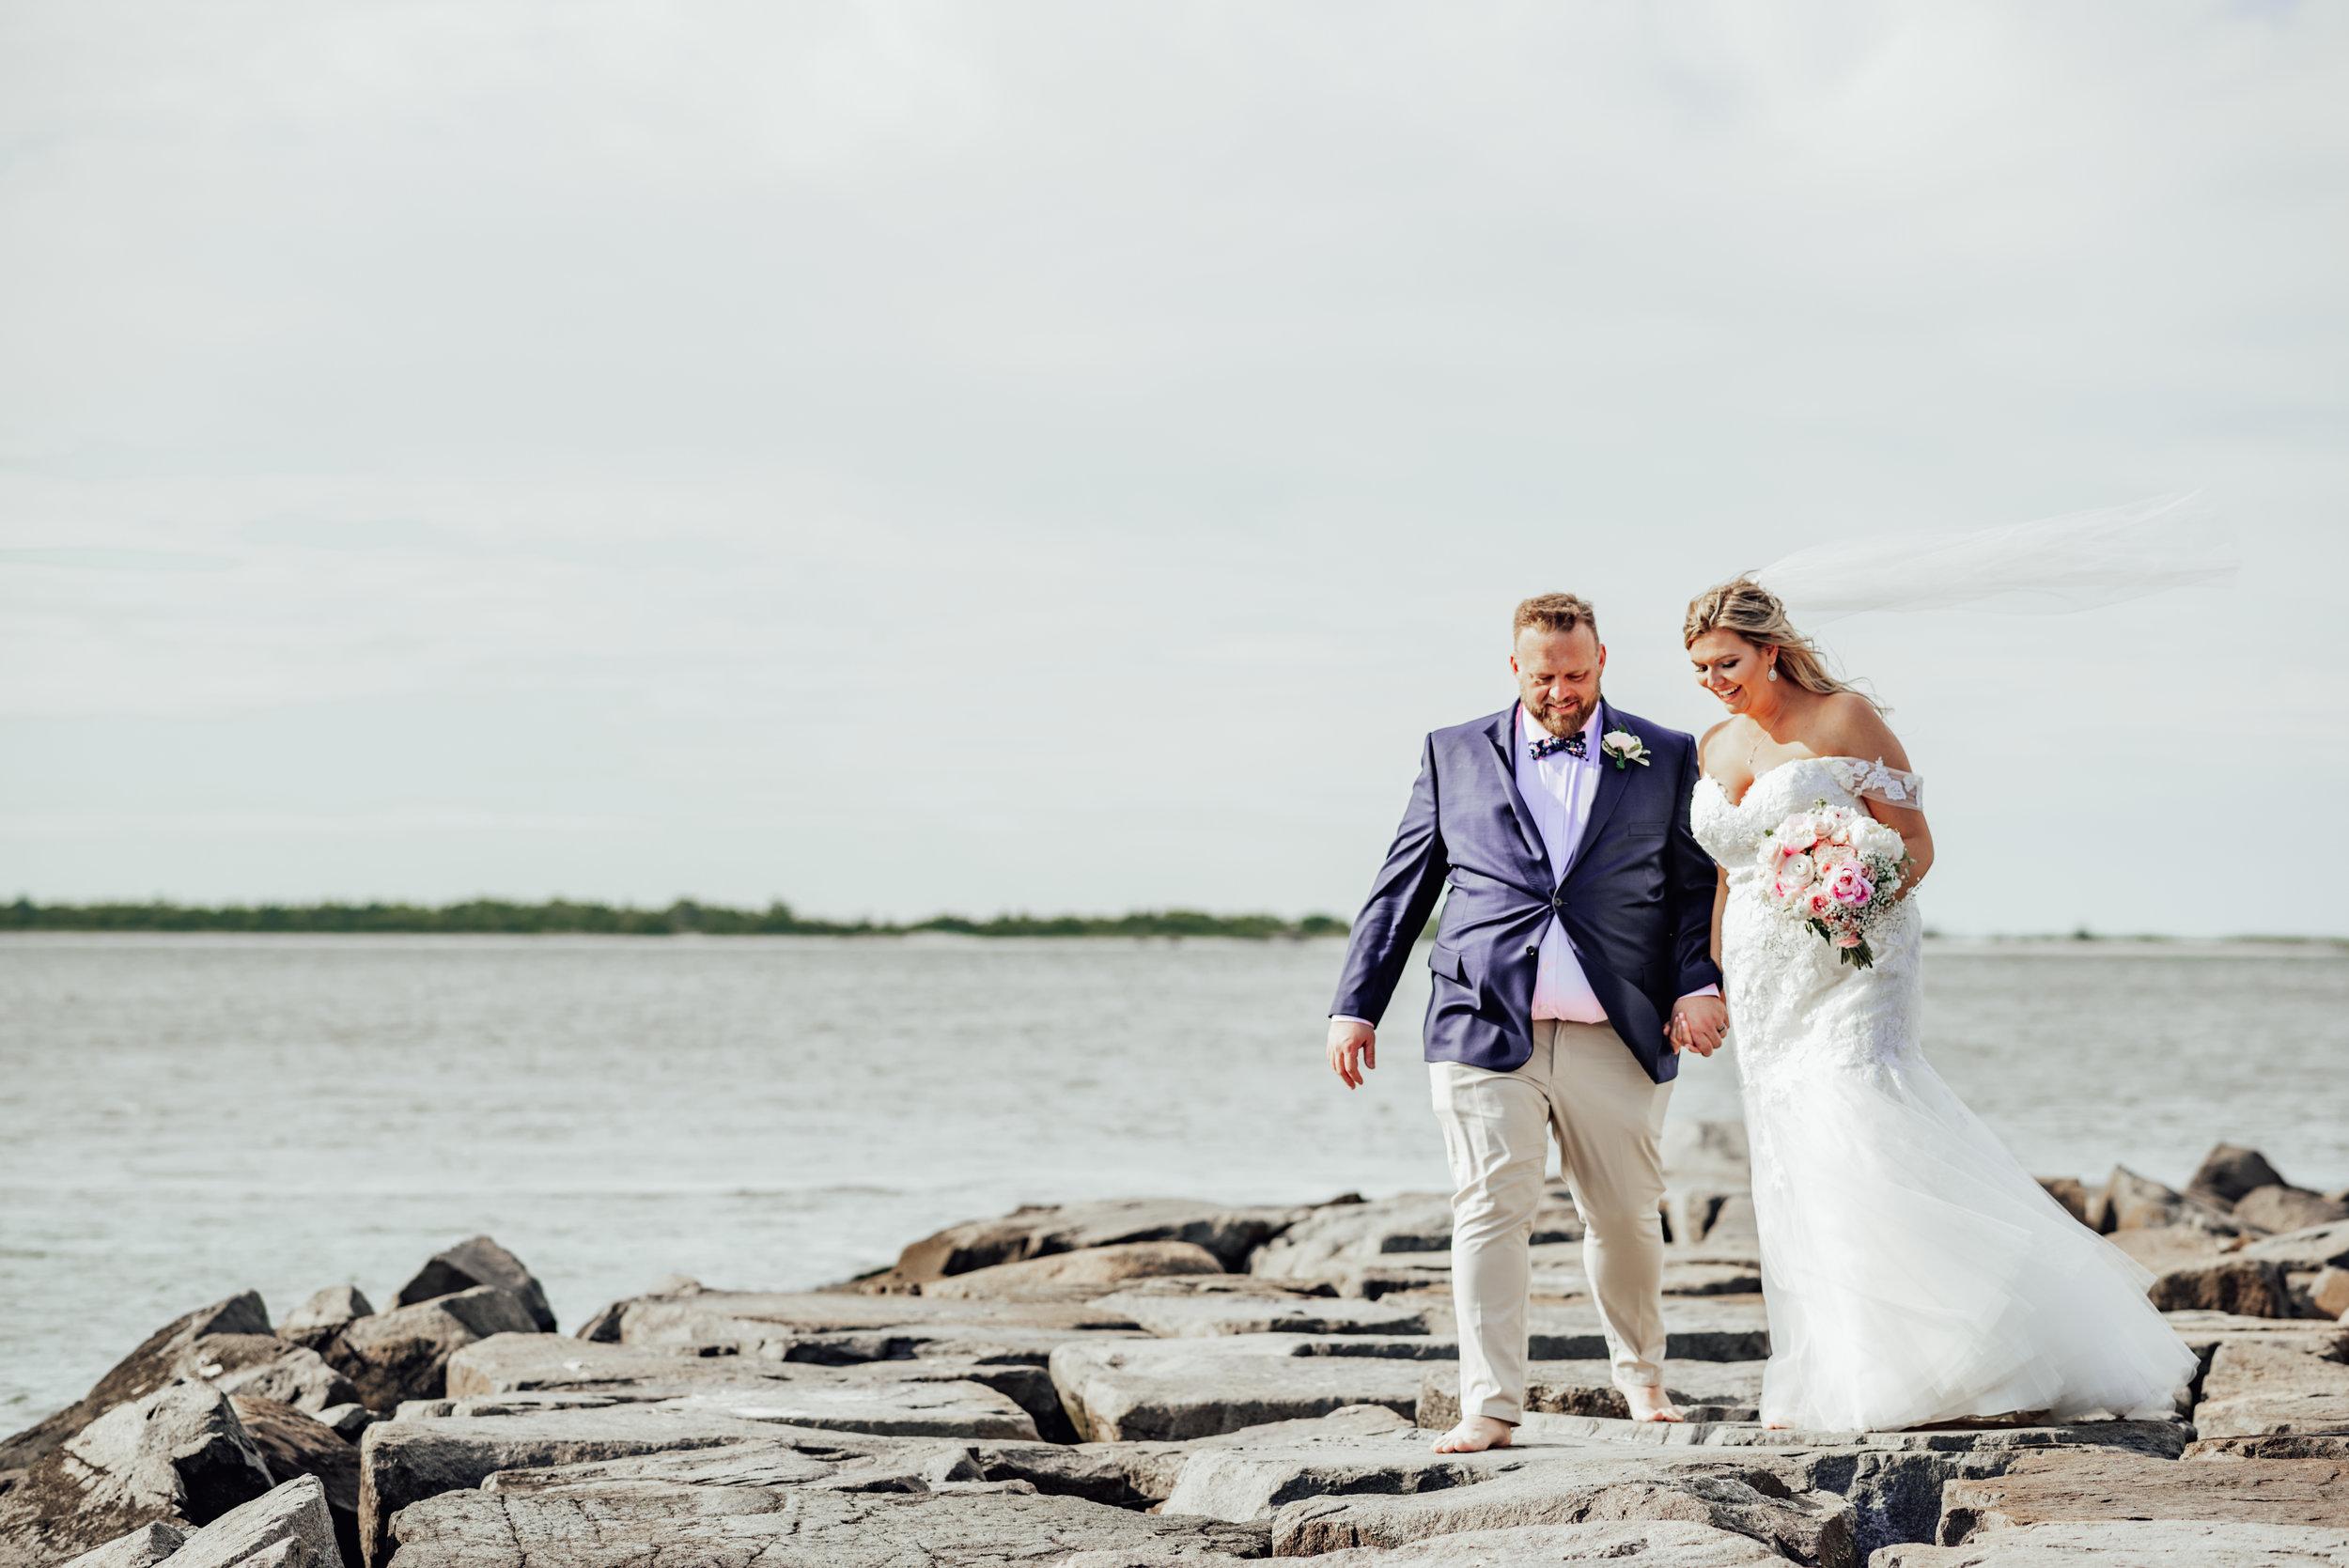 New Jersey Wedding Photographer, Felsberg Photography LBI wedding photography 79.jpg